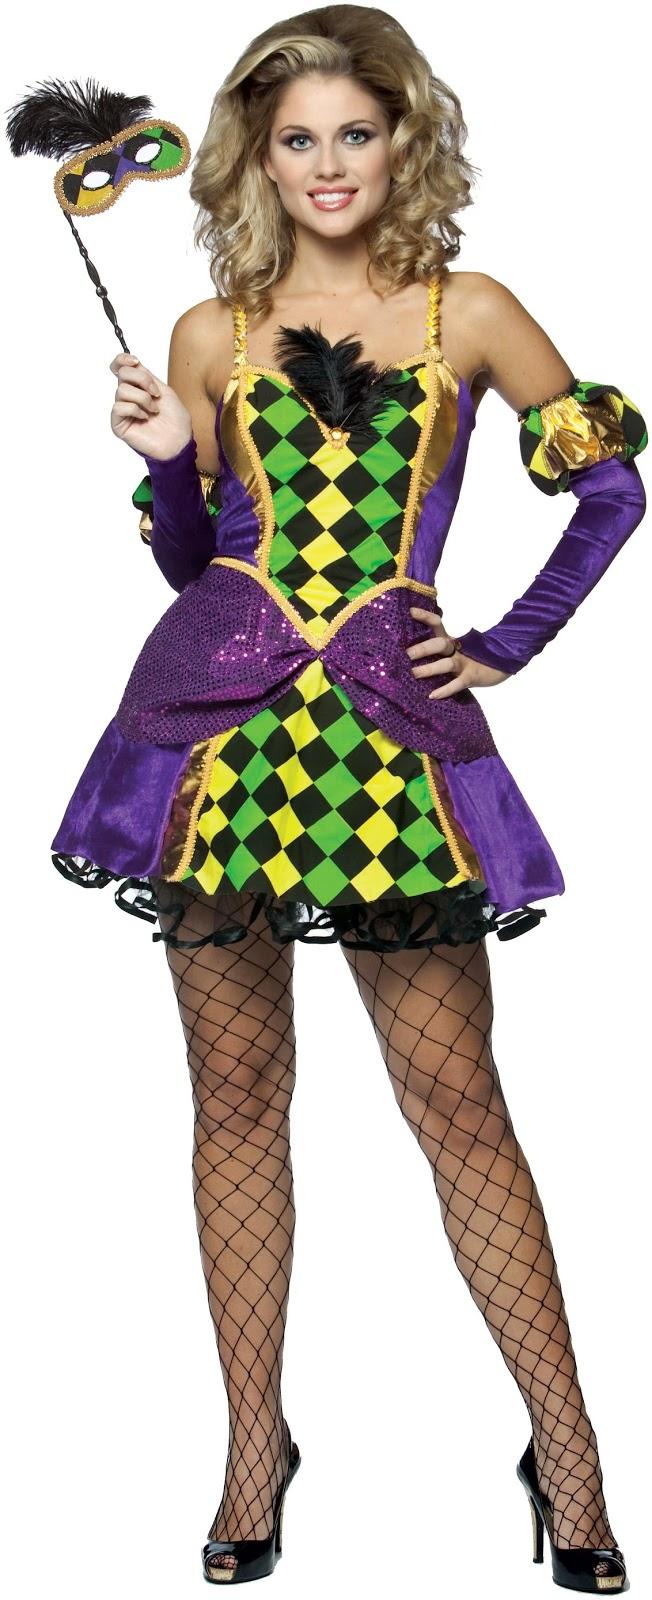 http://www.spicylegs.com/n.mardi-gras-costumes.0-0-8-0-6-0-0-0.aspx?utm_source=Blog&utm_medium=Navi&utm_campaign=Mardi%20Gras